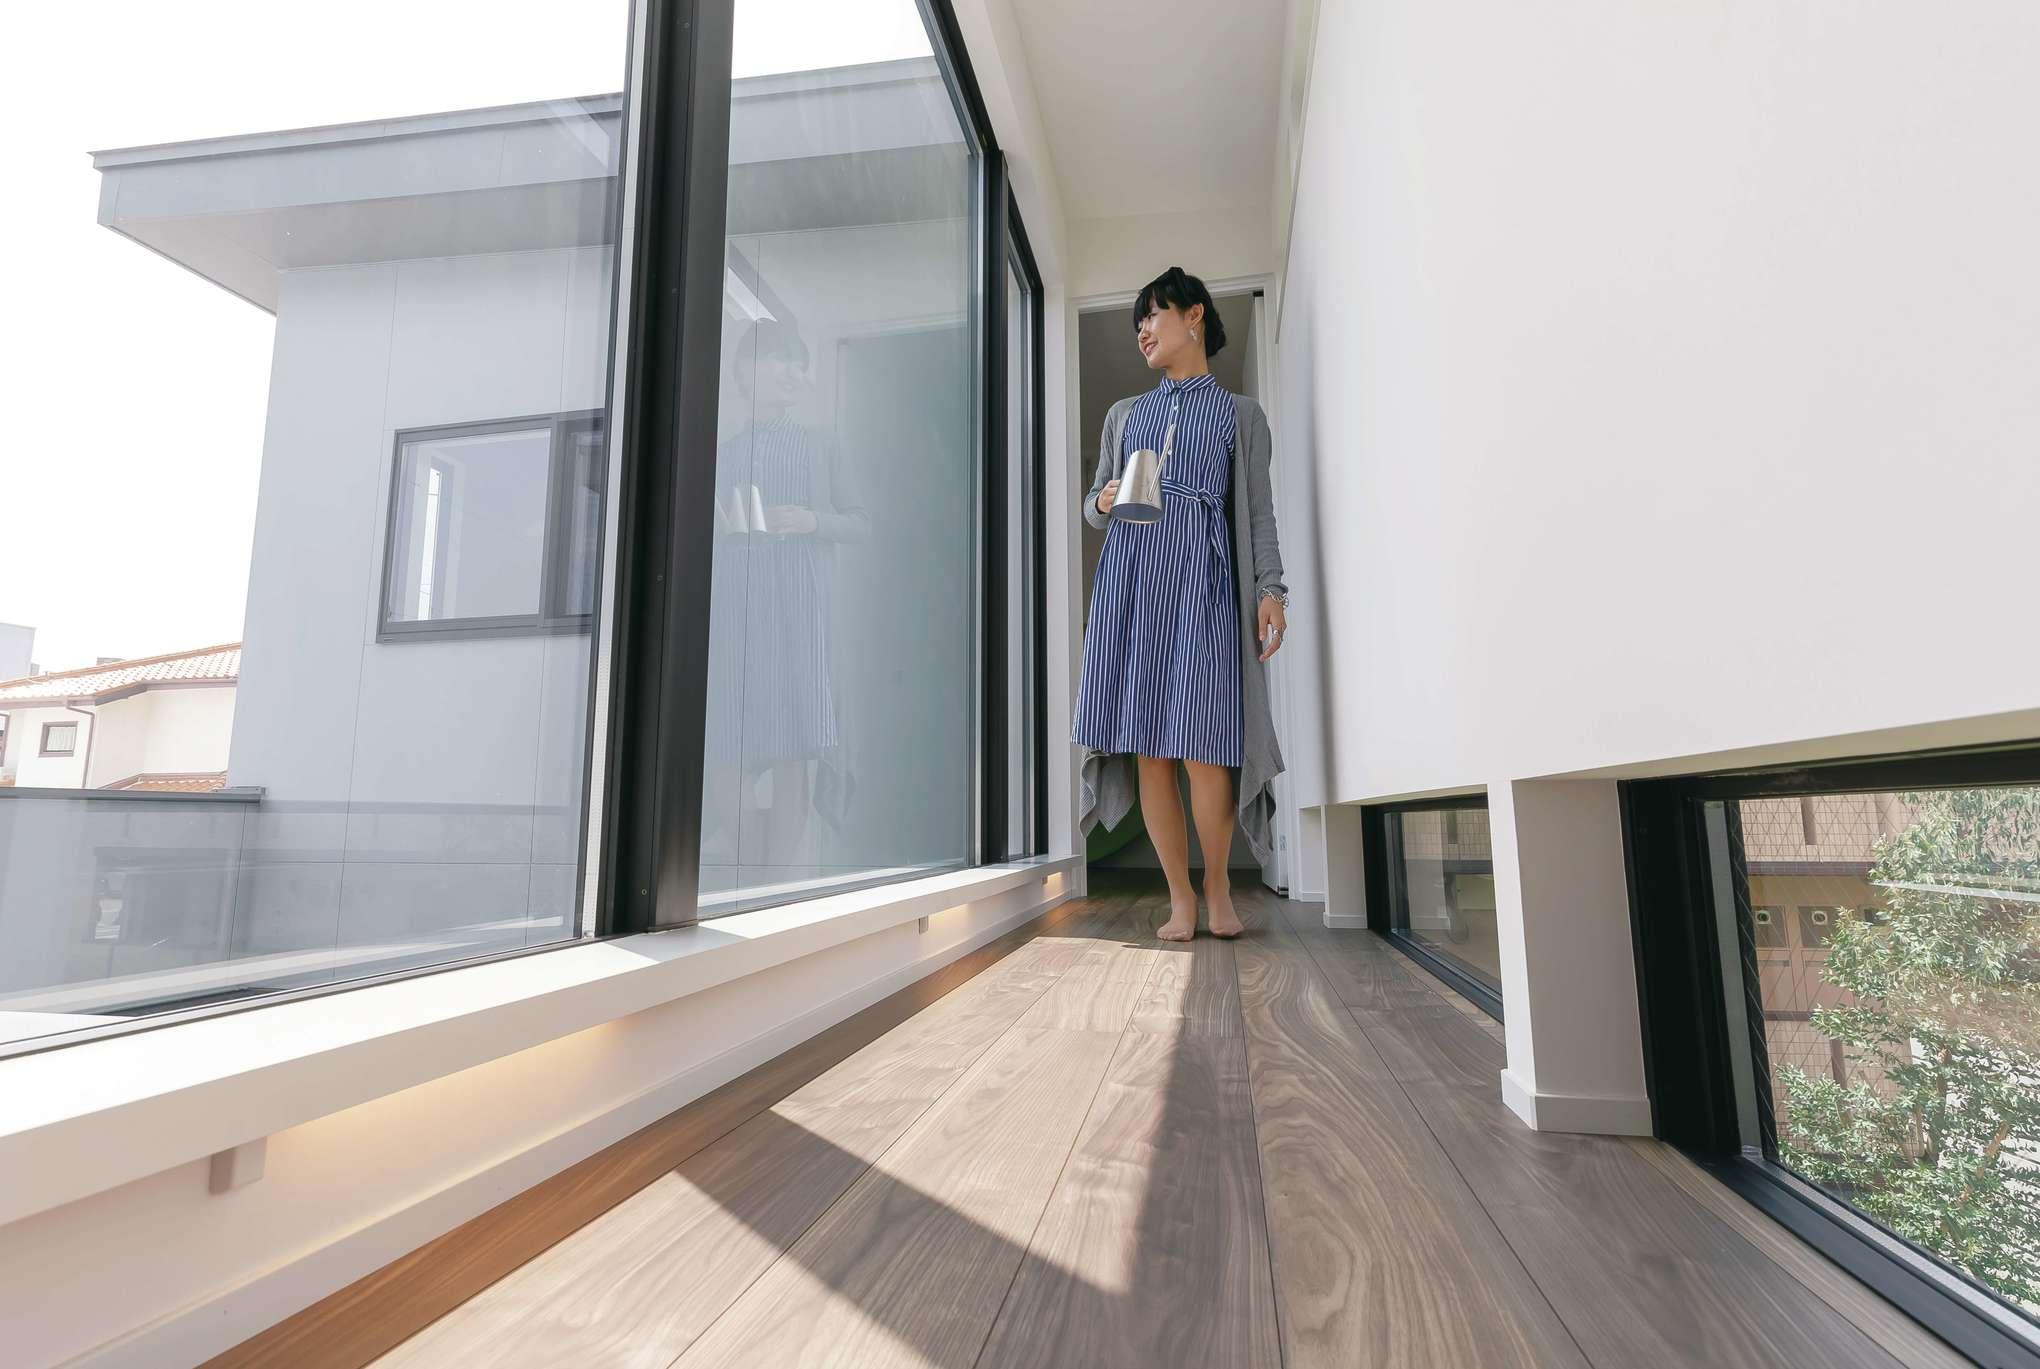 MABUCHI【デザイン住宅、省エネ、建築家】2階の廊下にも大開口を確保して開放感を創出。夜は間接照明が足元を照らす